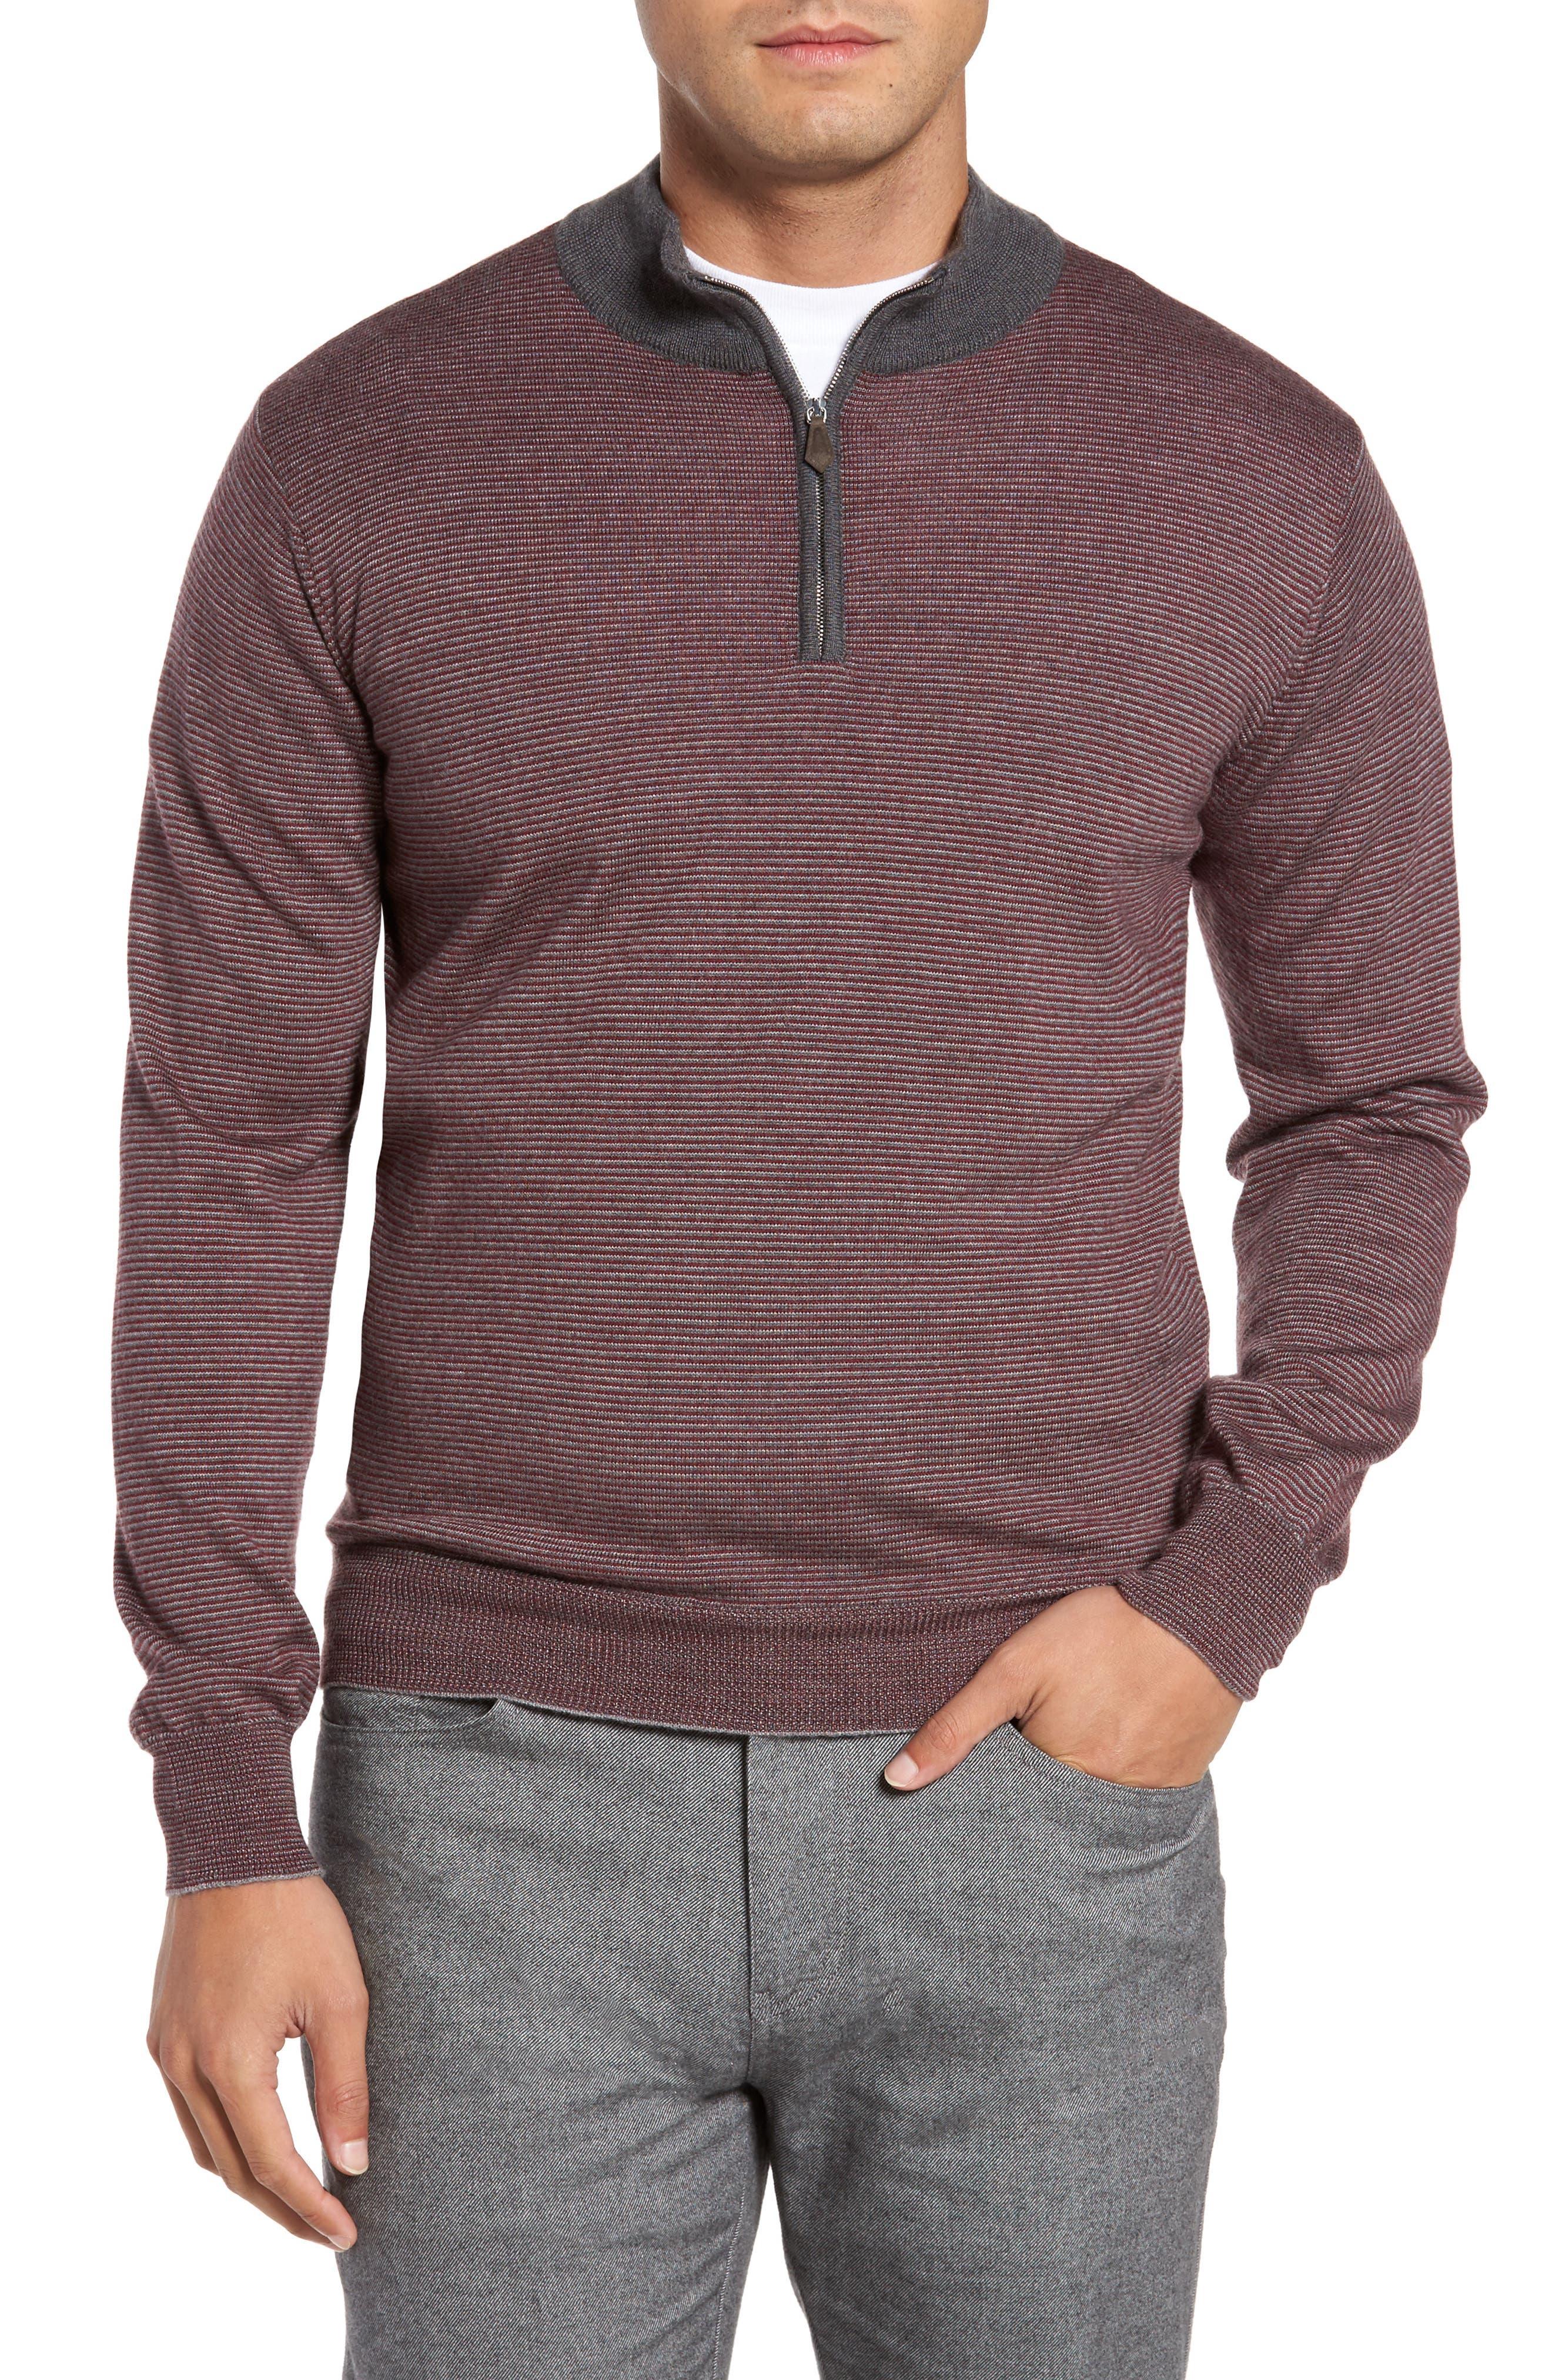 Trichrome Stripe Merino Wool Blend Sweater,                             Main thumbnail 1, color,                             930